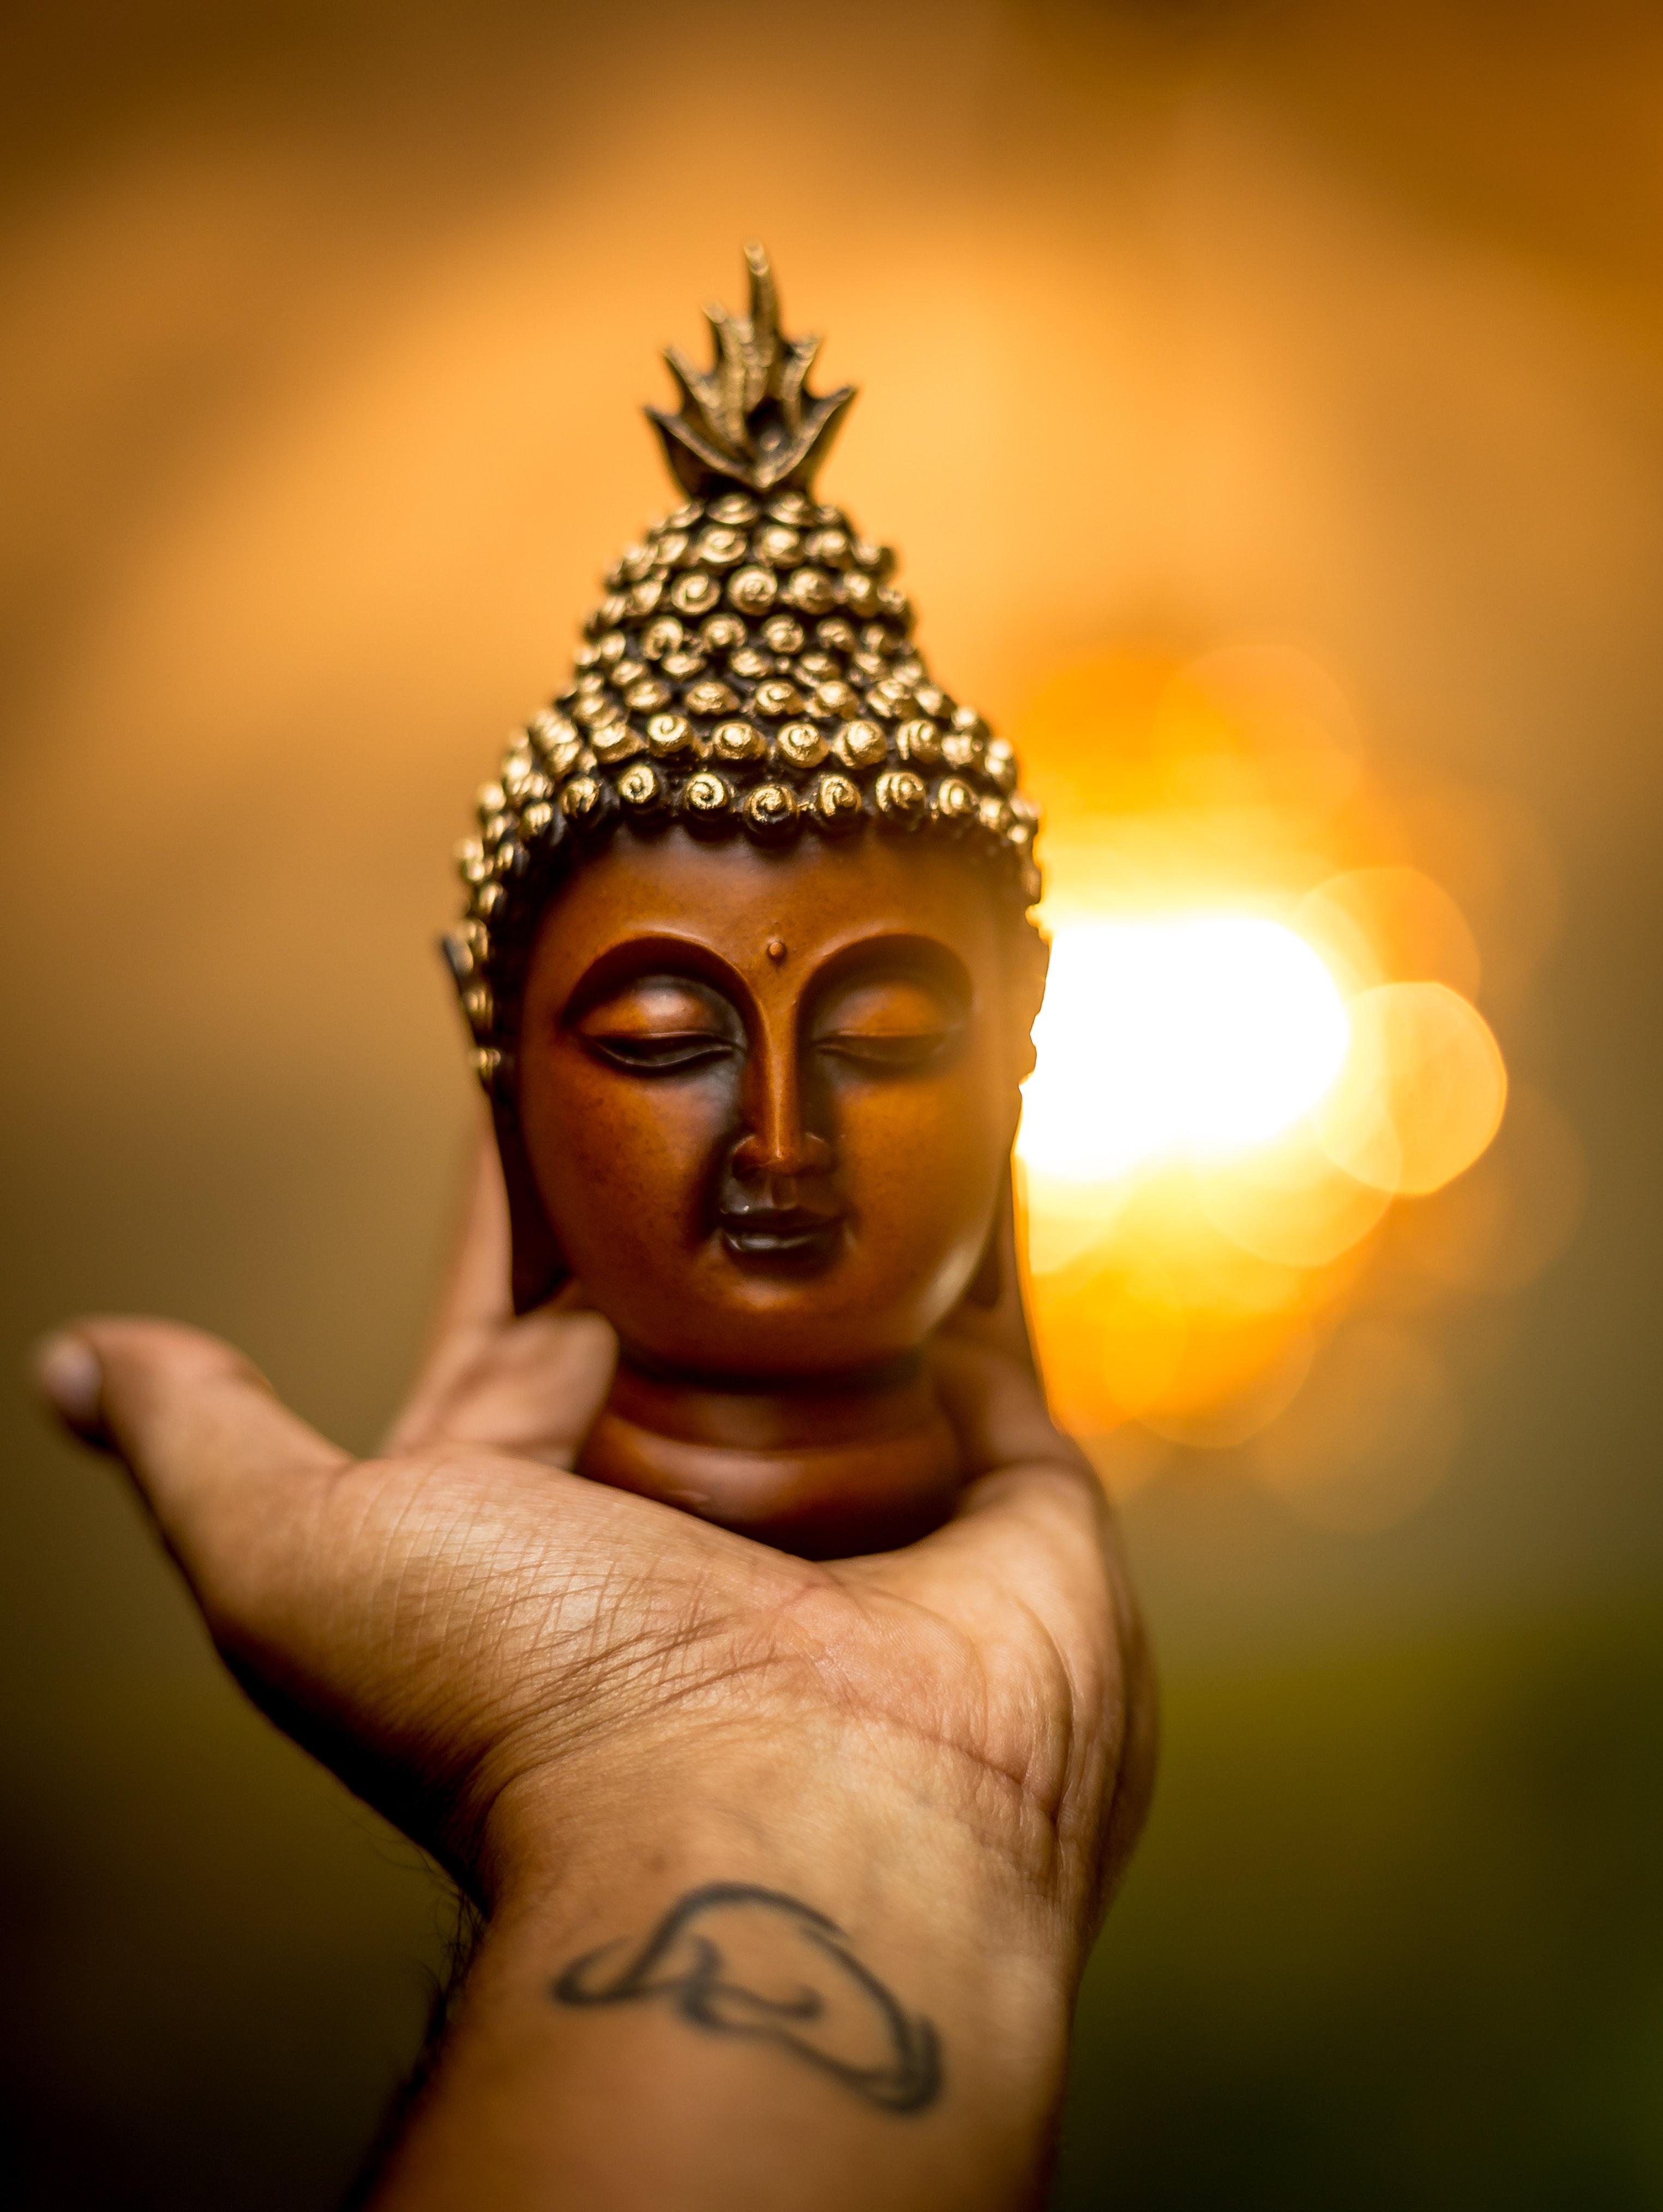 Kostenloses Foto Zum Thema Bokeh Buddha Buddhismus